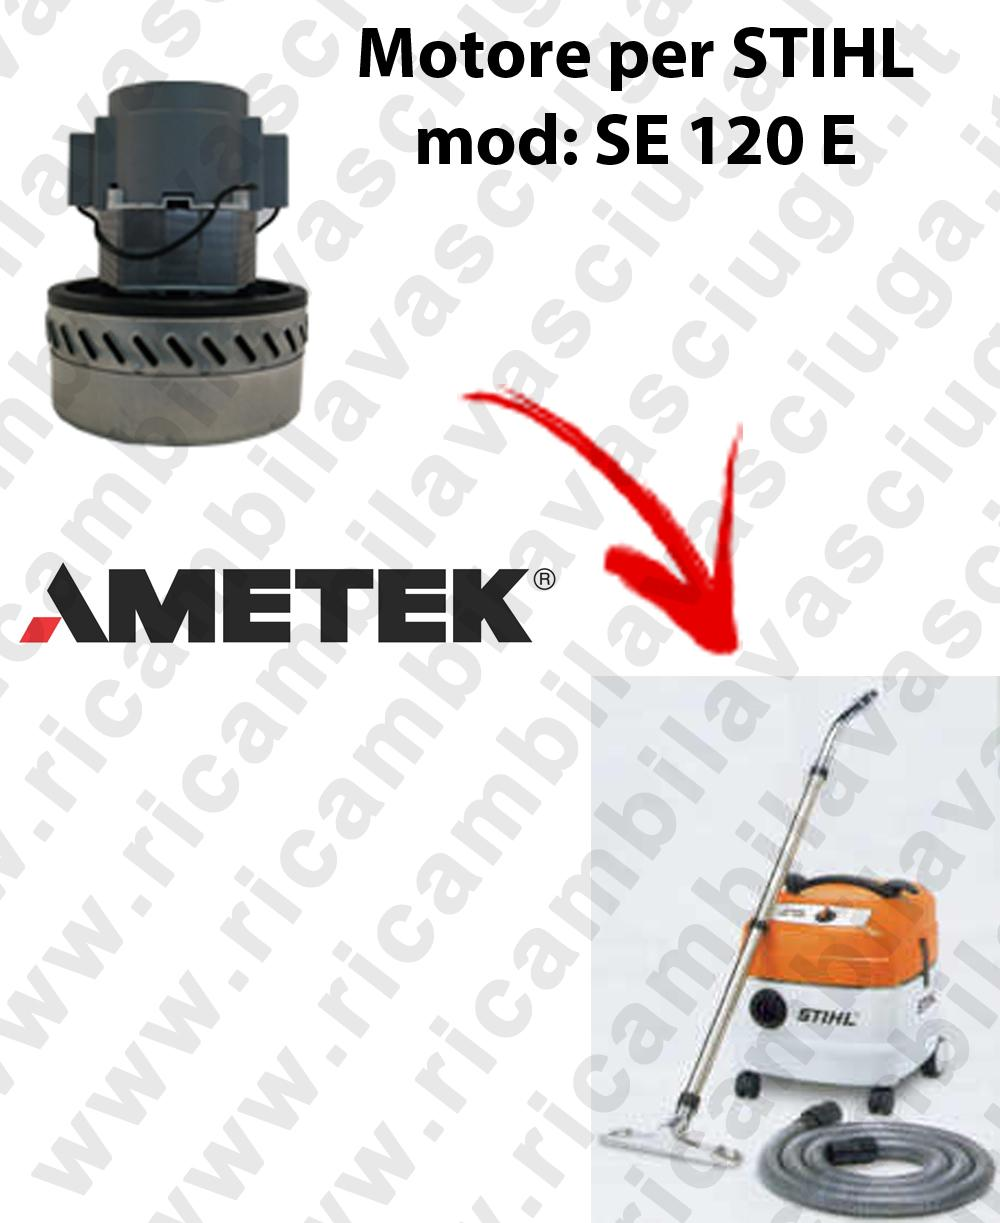 Motore aspirazione AMETEK per aspirapolvere SE 120 E - STIHL